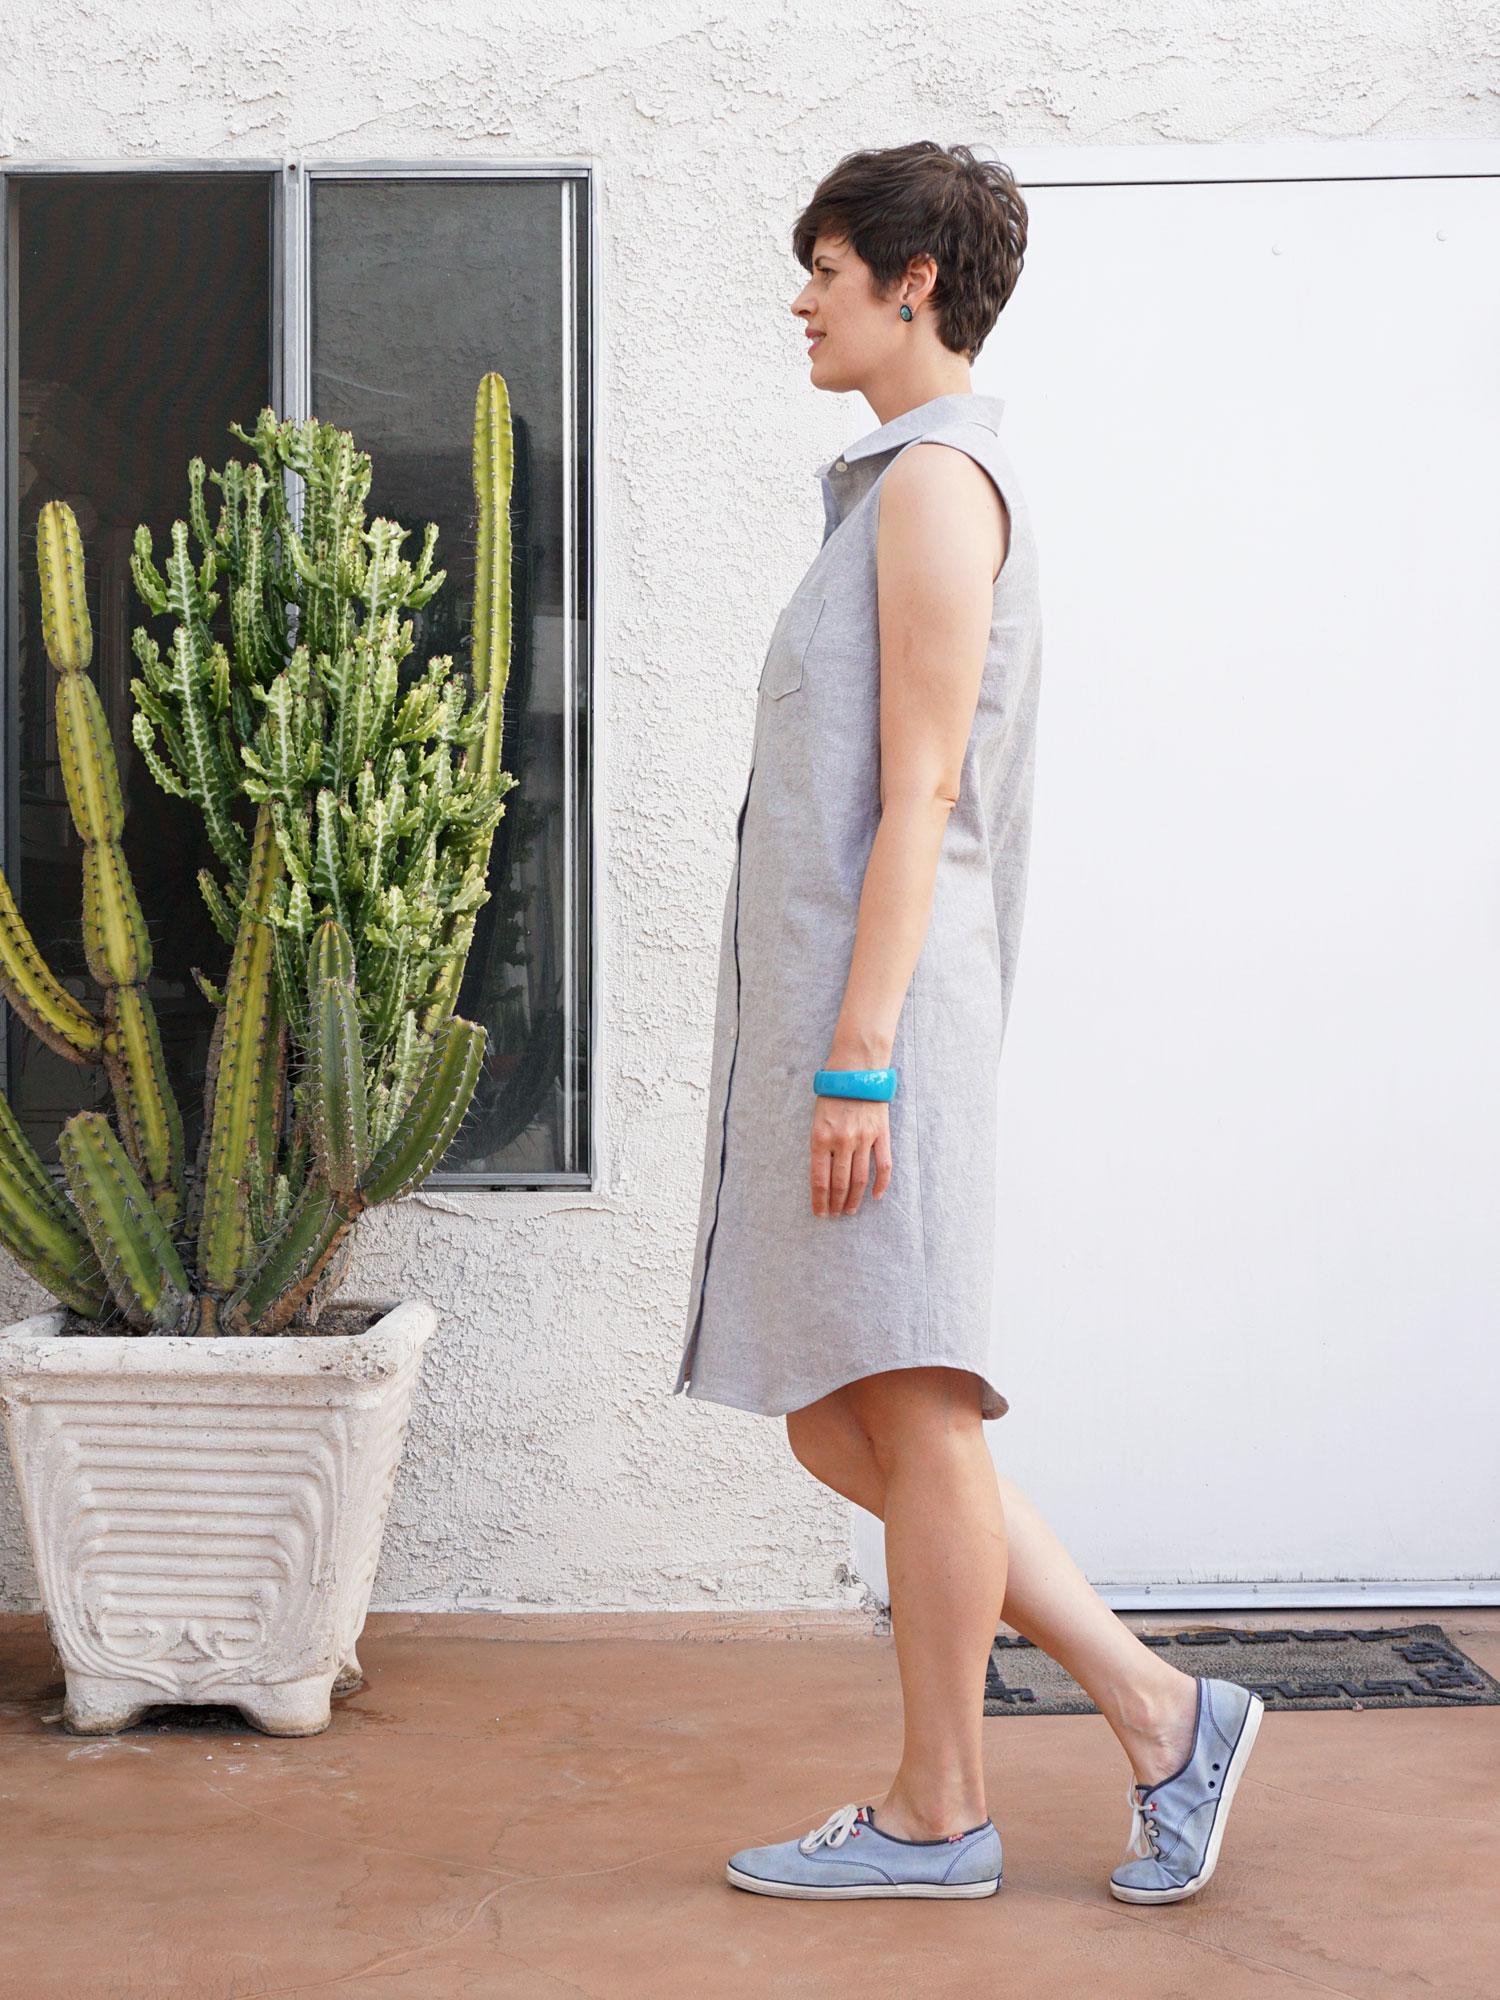 DIY Linen Shirtdress, review of the Alder Shirtdress sewing pattern by Grainline Studio | Sew DIY